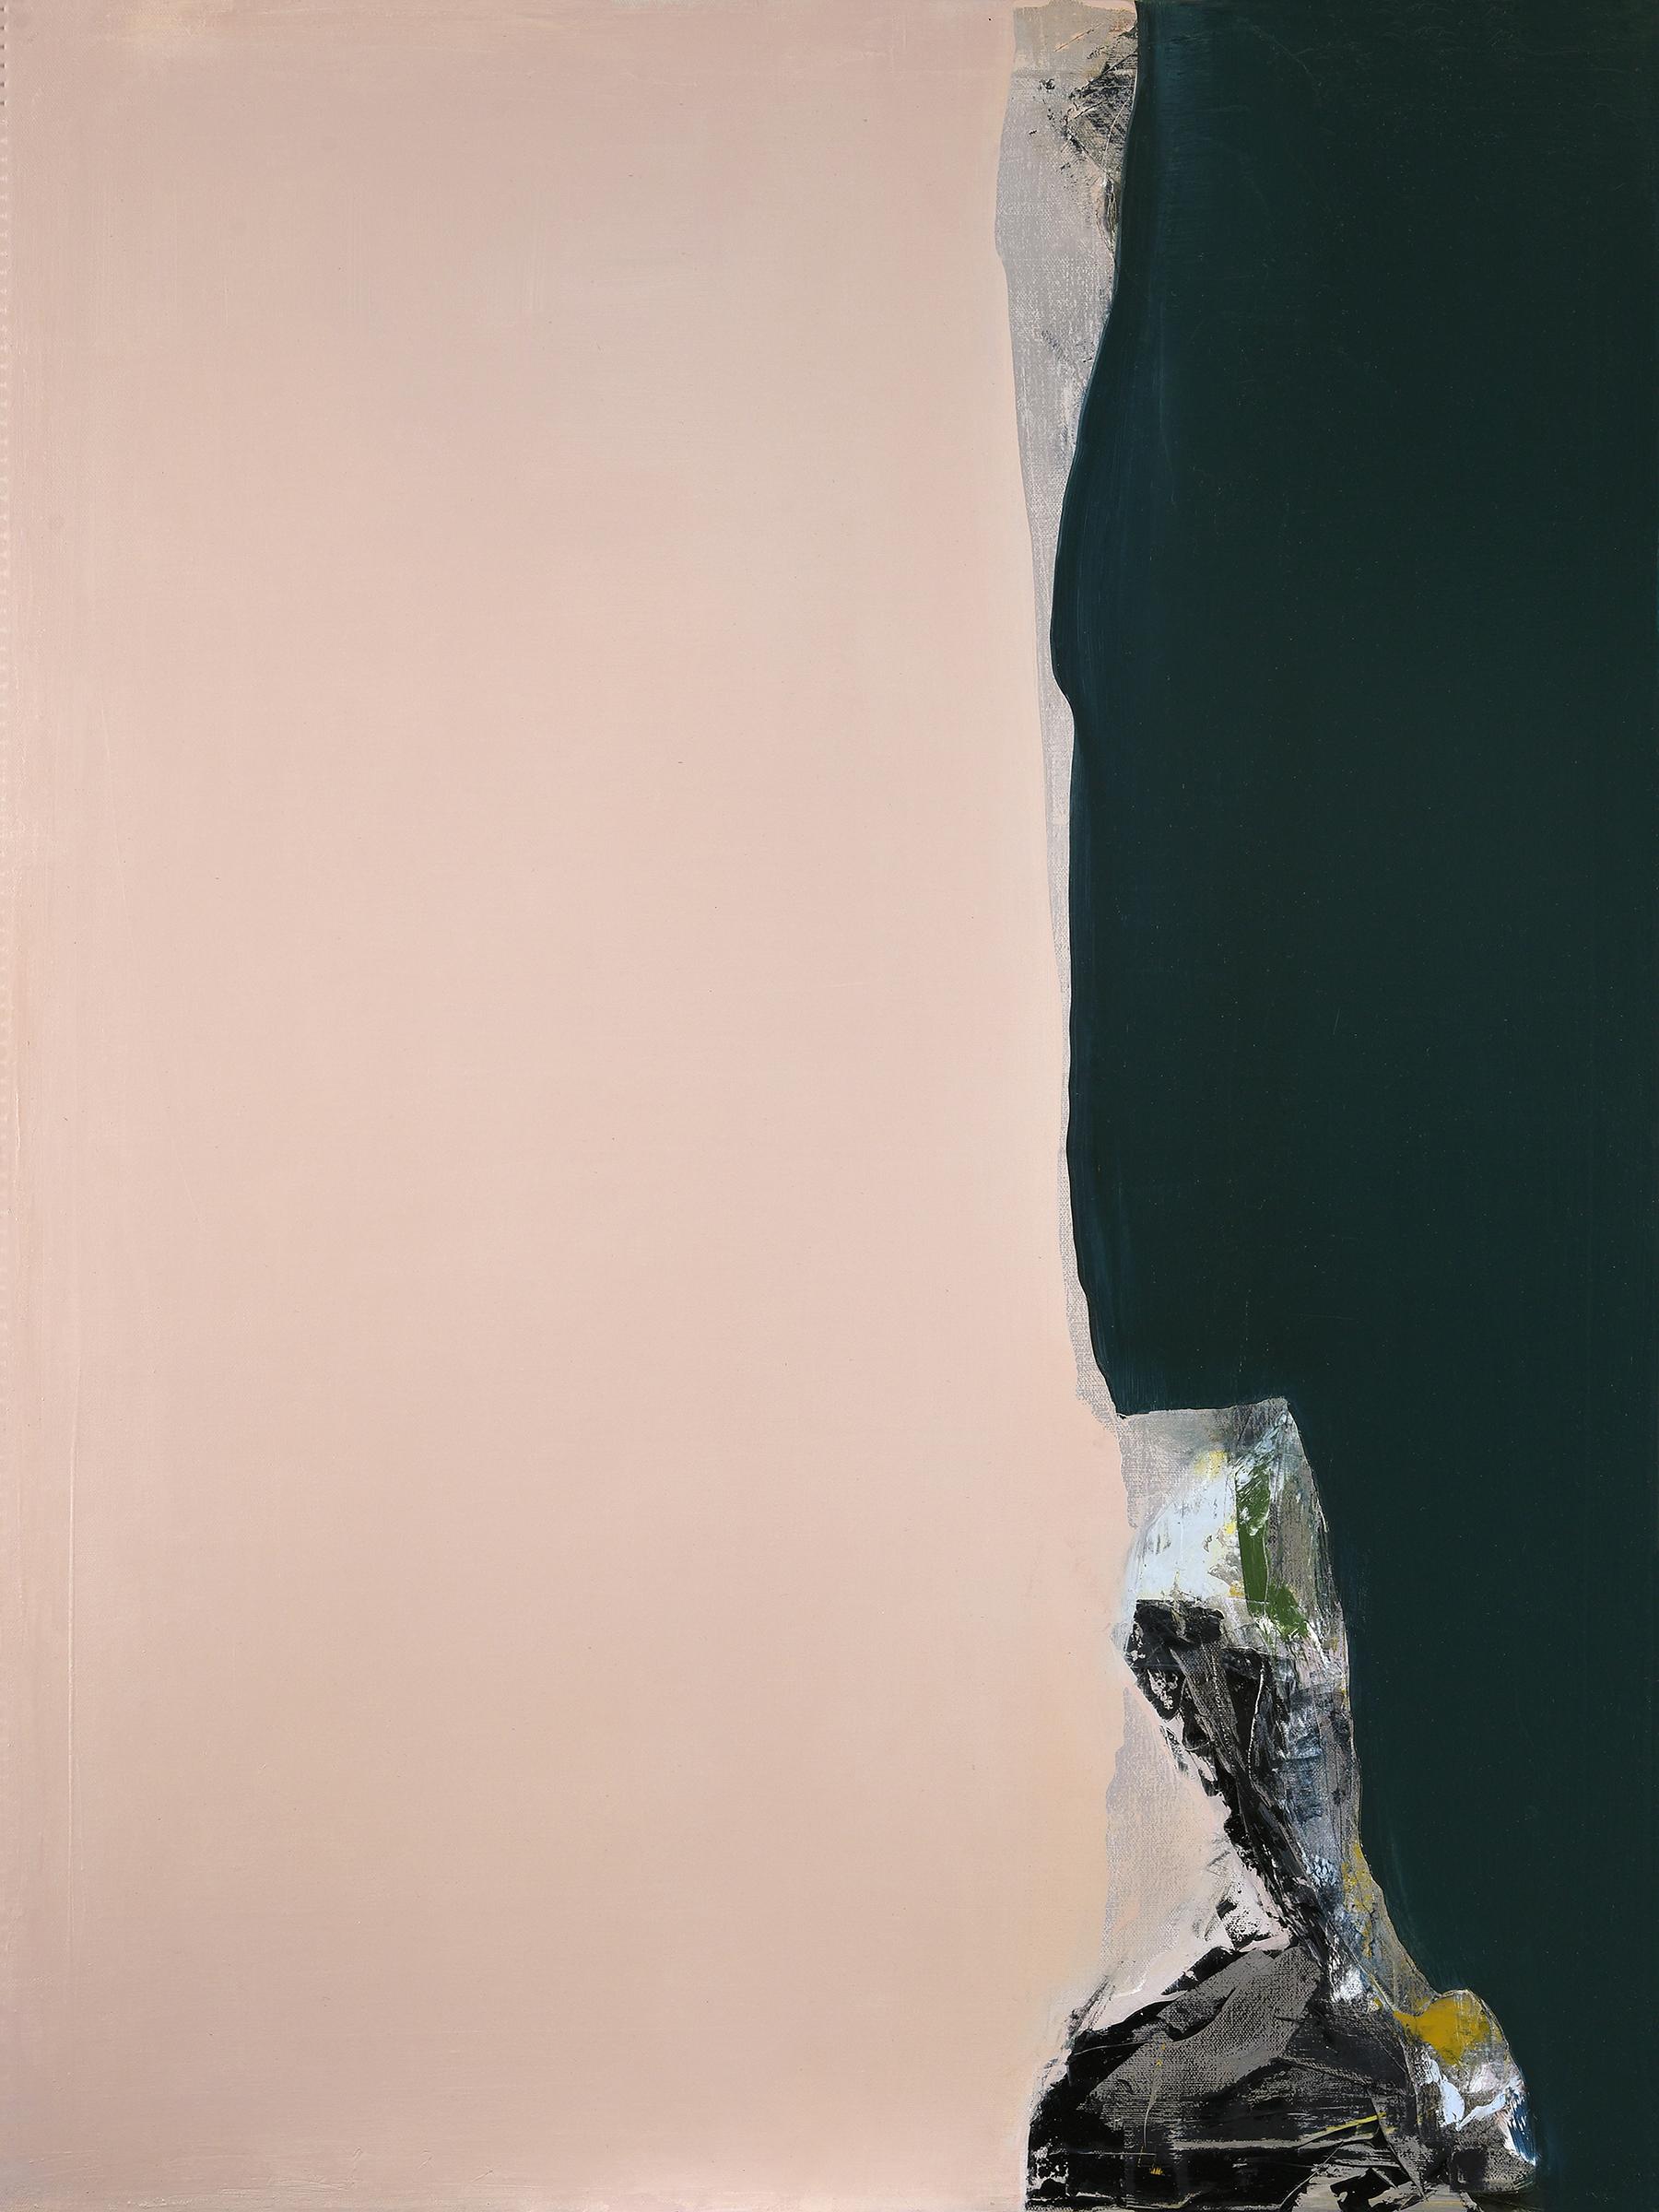 Untitled 1 Oil on canvas 30x40.jpg